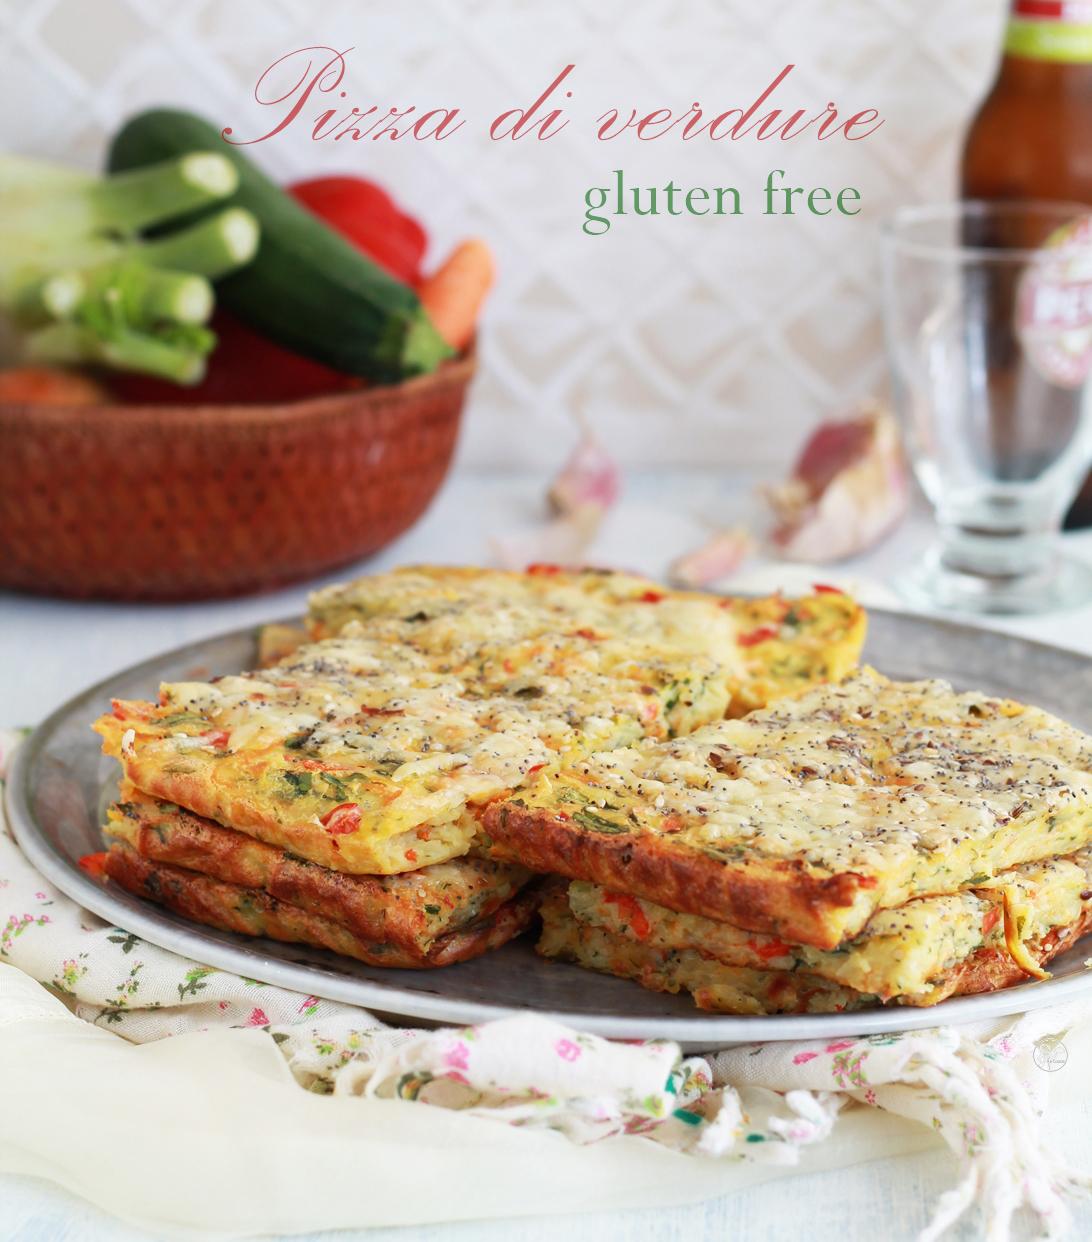 Pizza di verdure senza glutine - La Cassata Celiaca